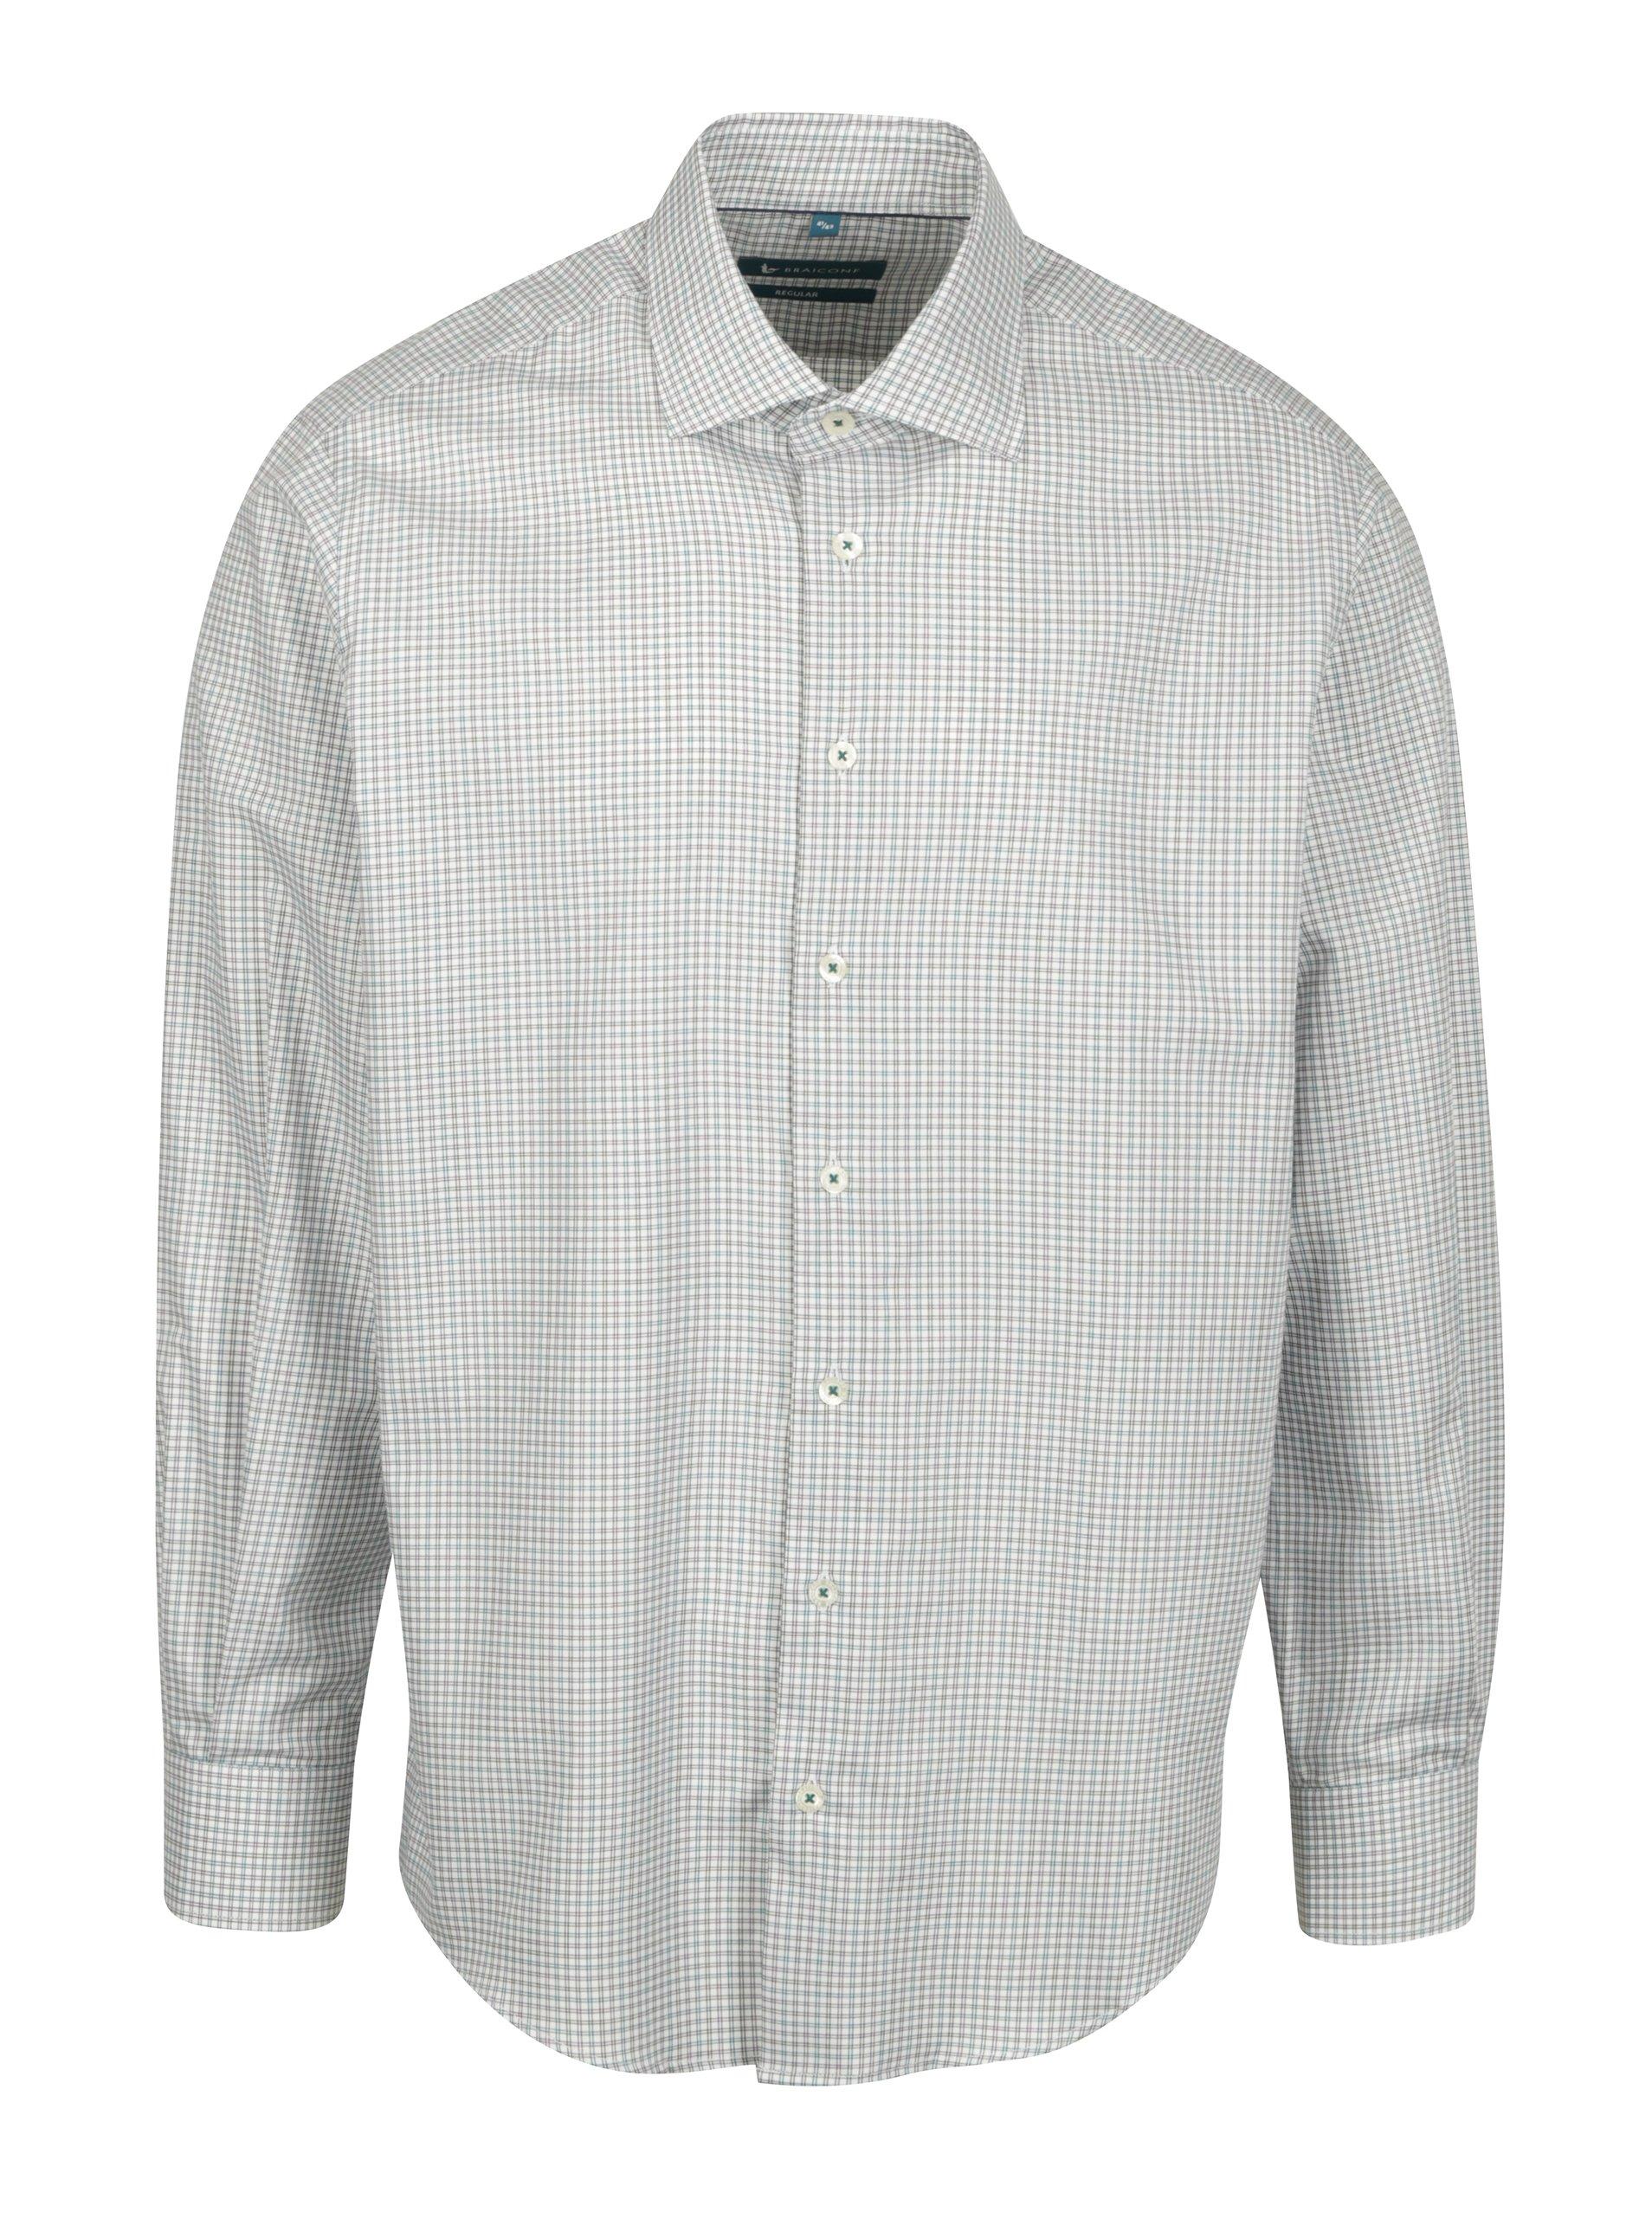 Krémová vzorovaná neformální regular fit košile Braiconf Nicoara